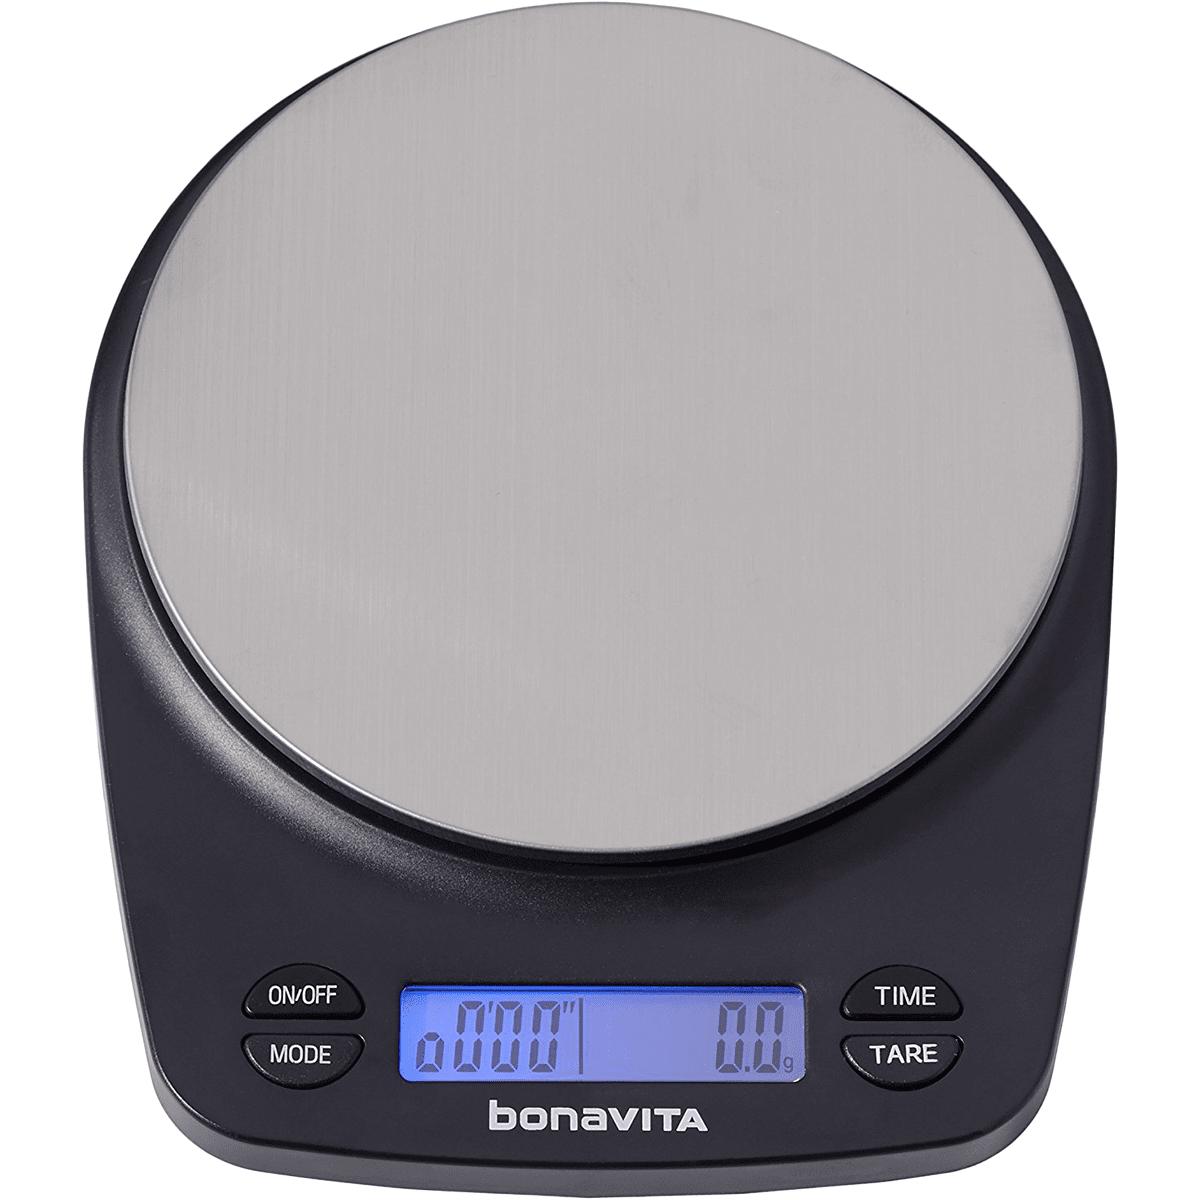 Bonavita Rechargeable Coffee Scale (BV02001MU)